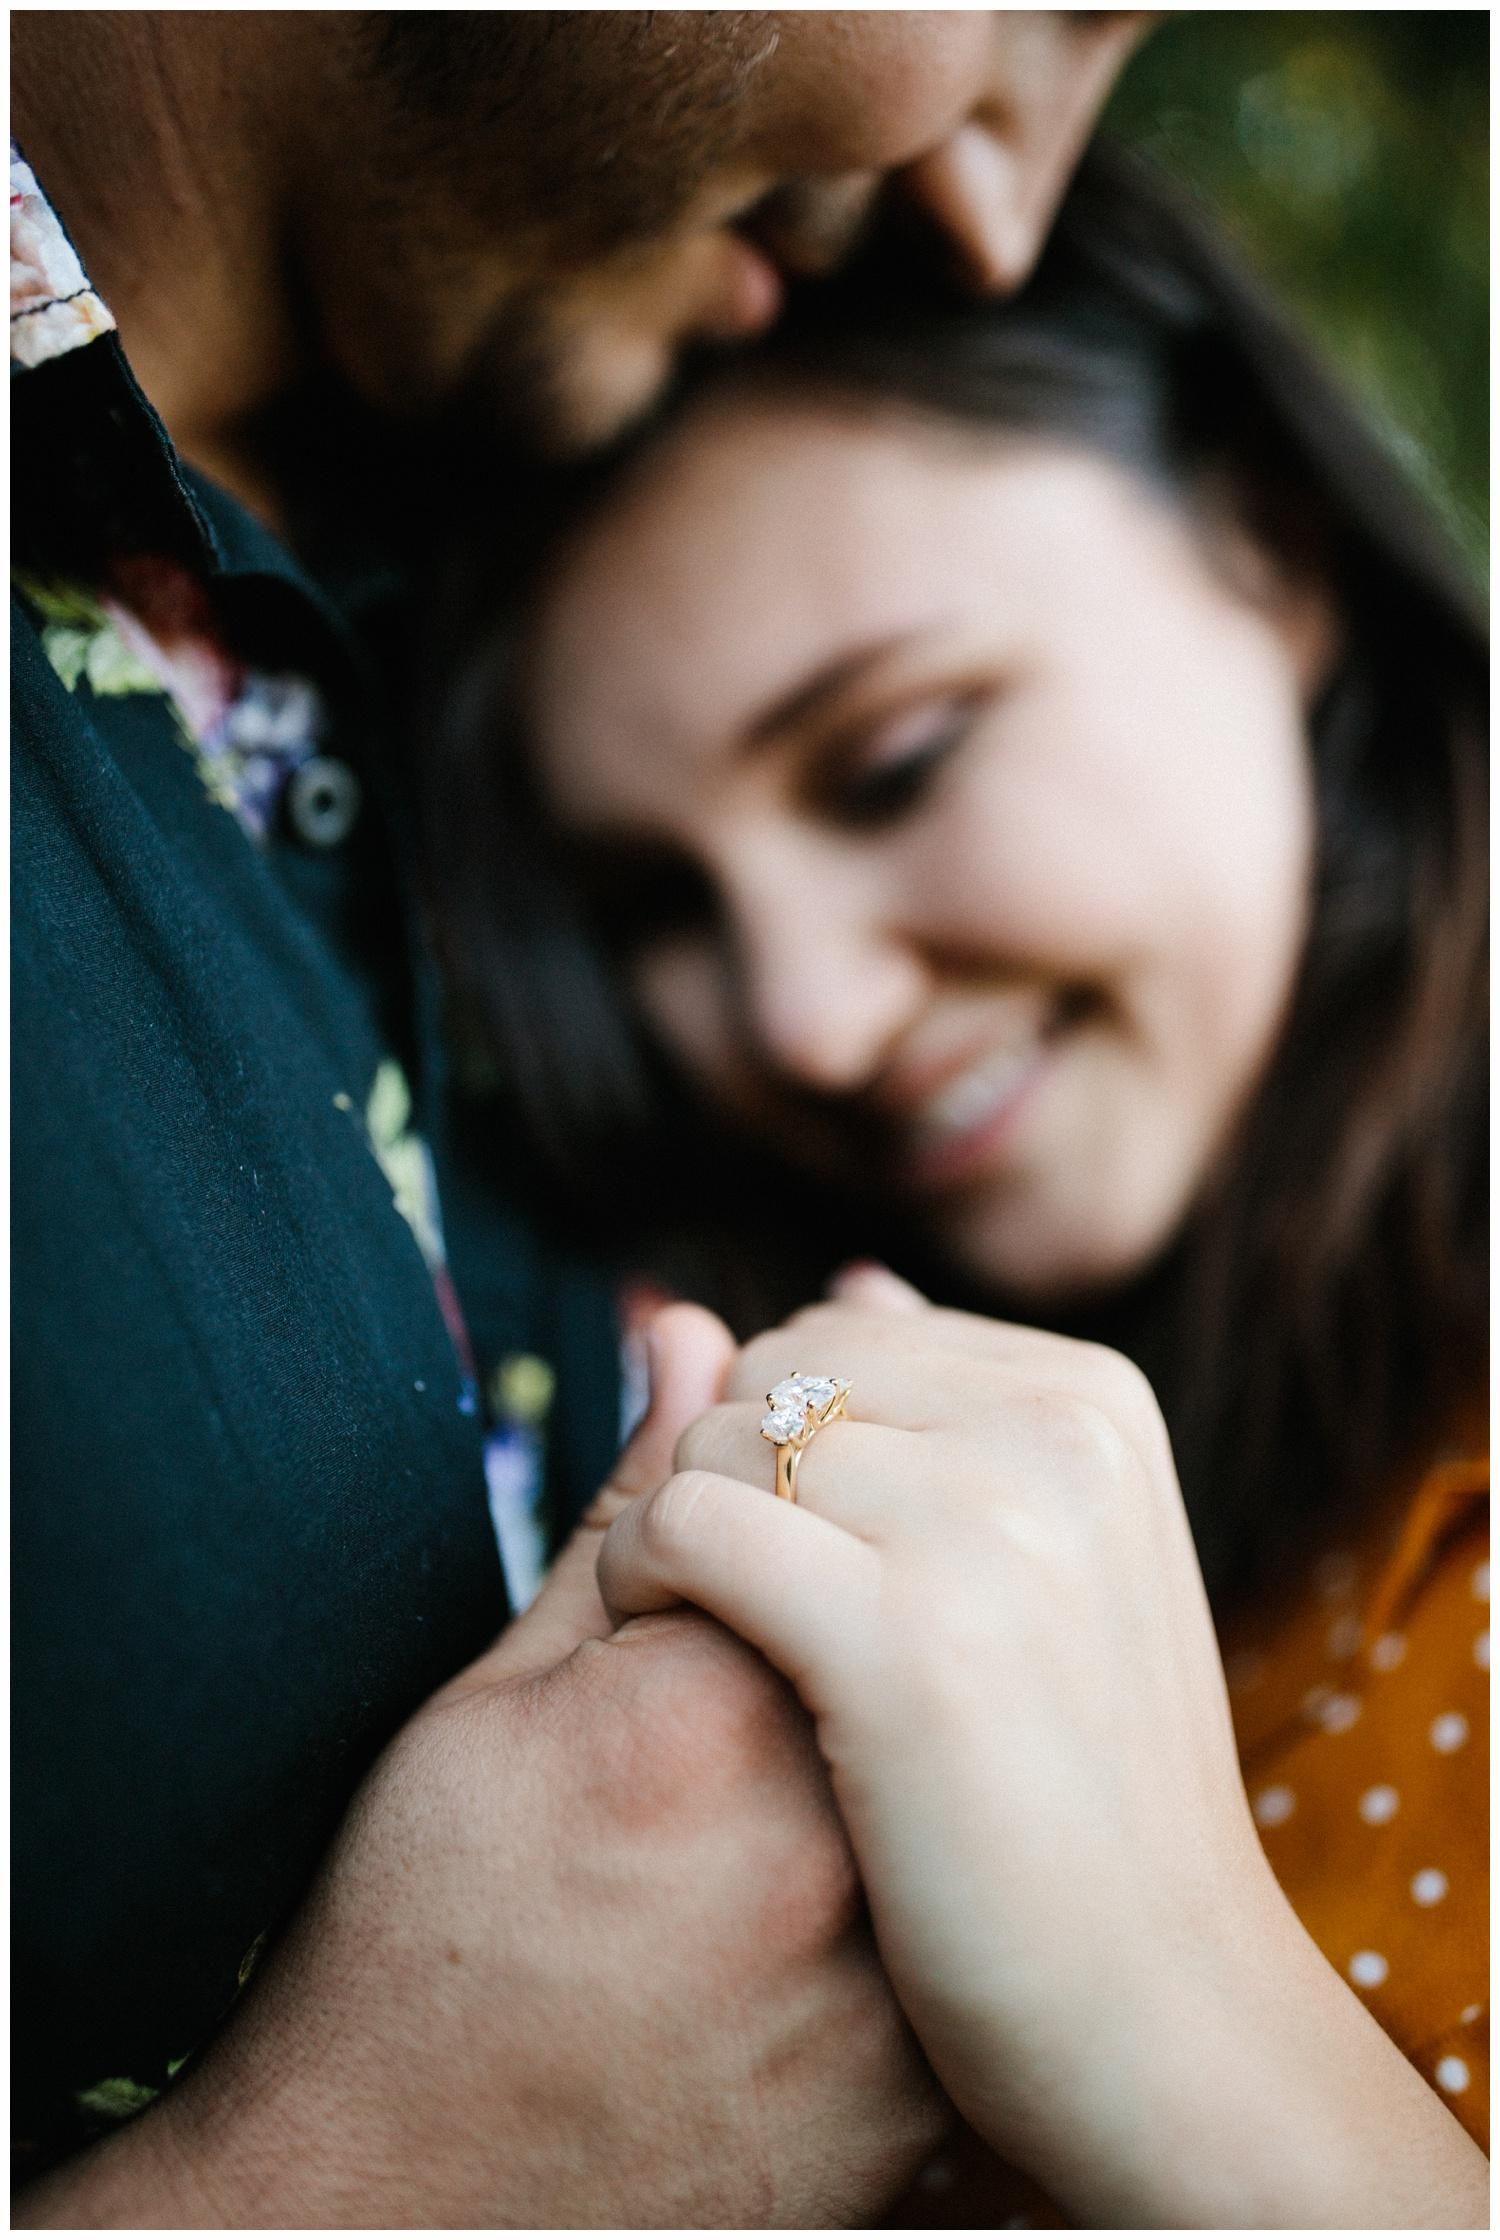 texas proposal engagement photoshoot_038.jpg